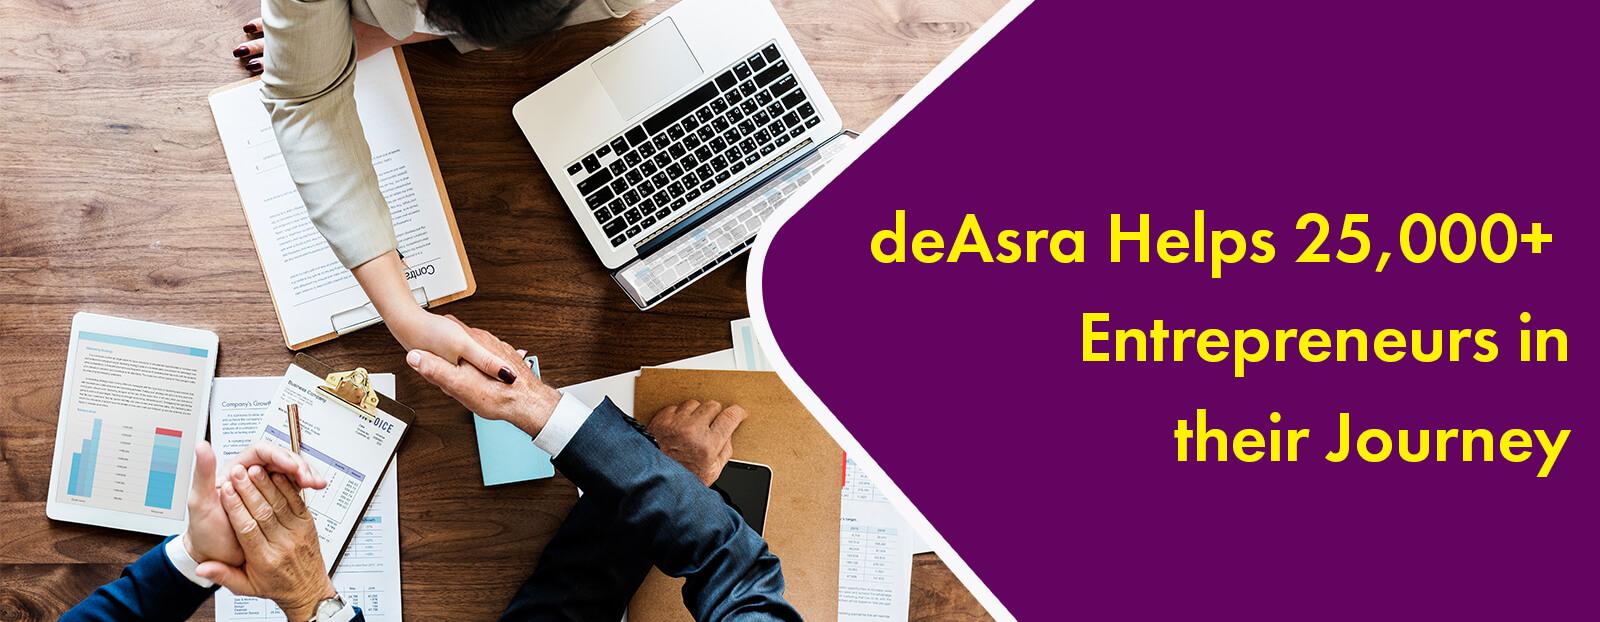 deAsra Helps 25,000+ Entrepreneurs in their Journey